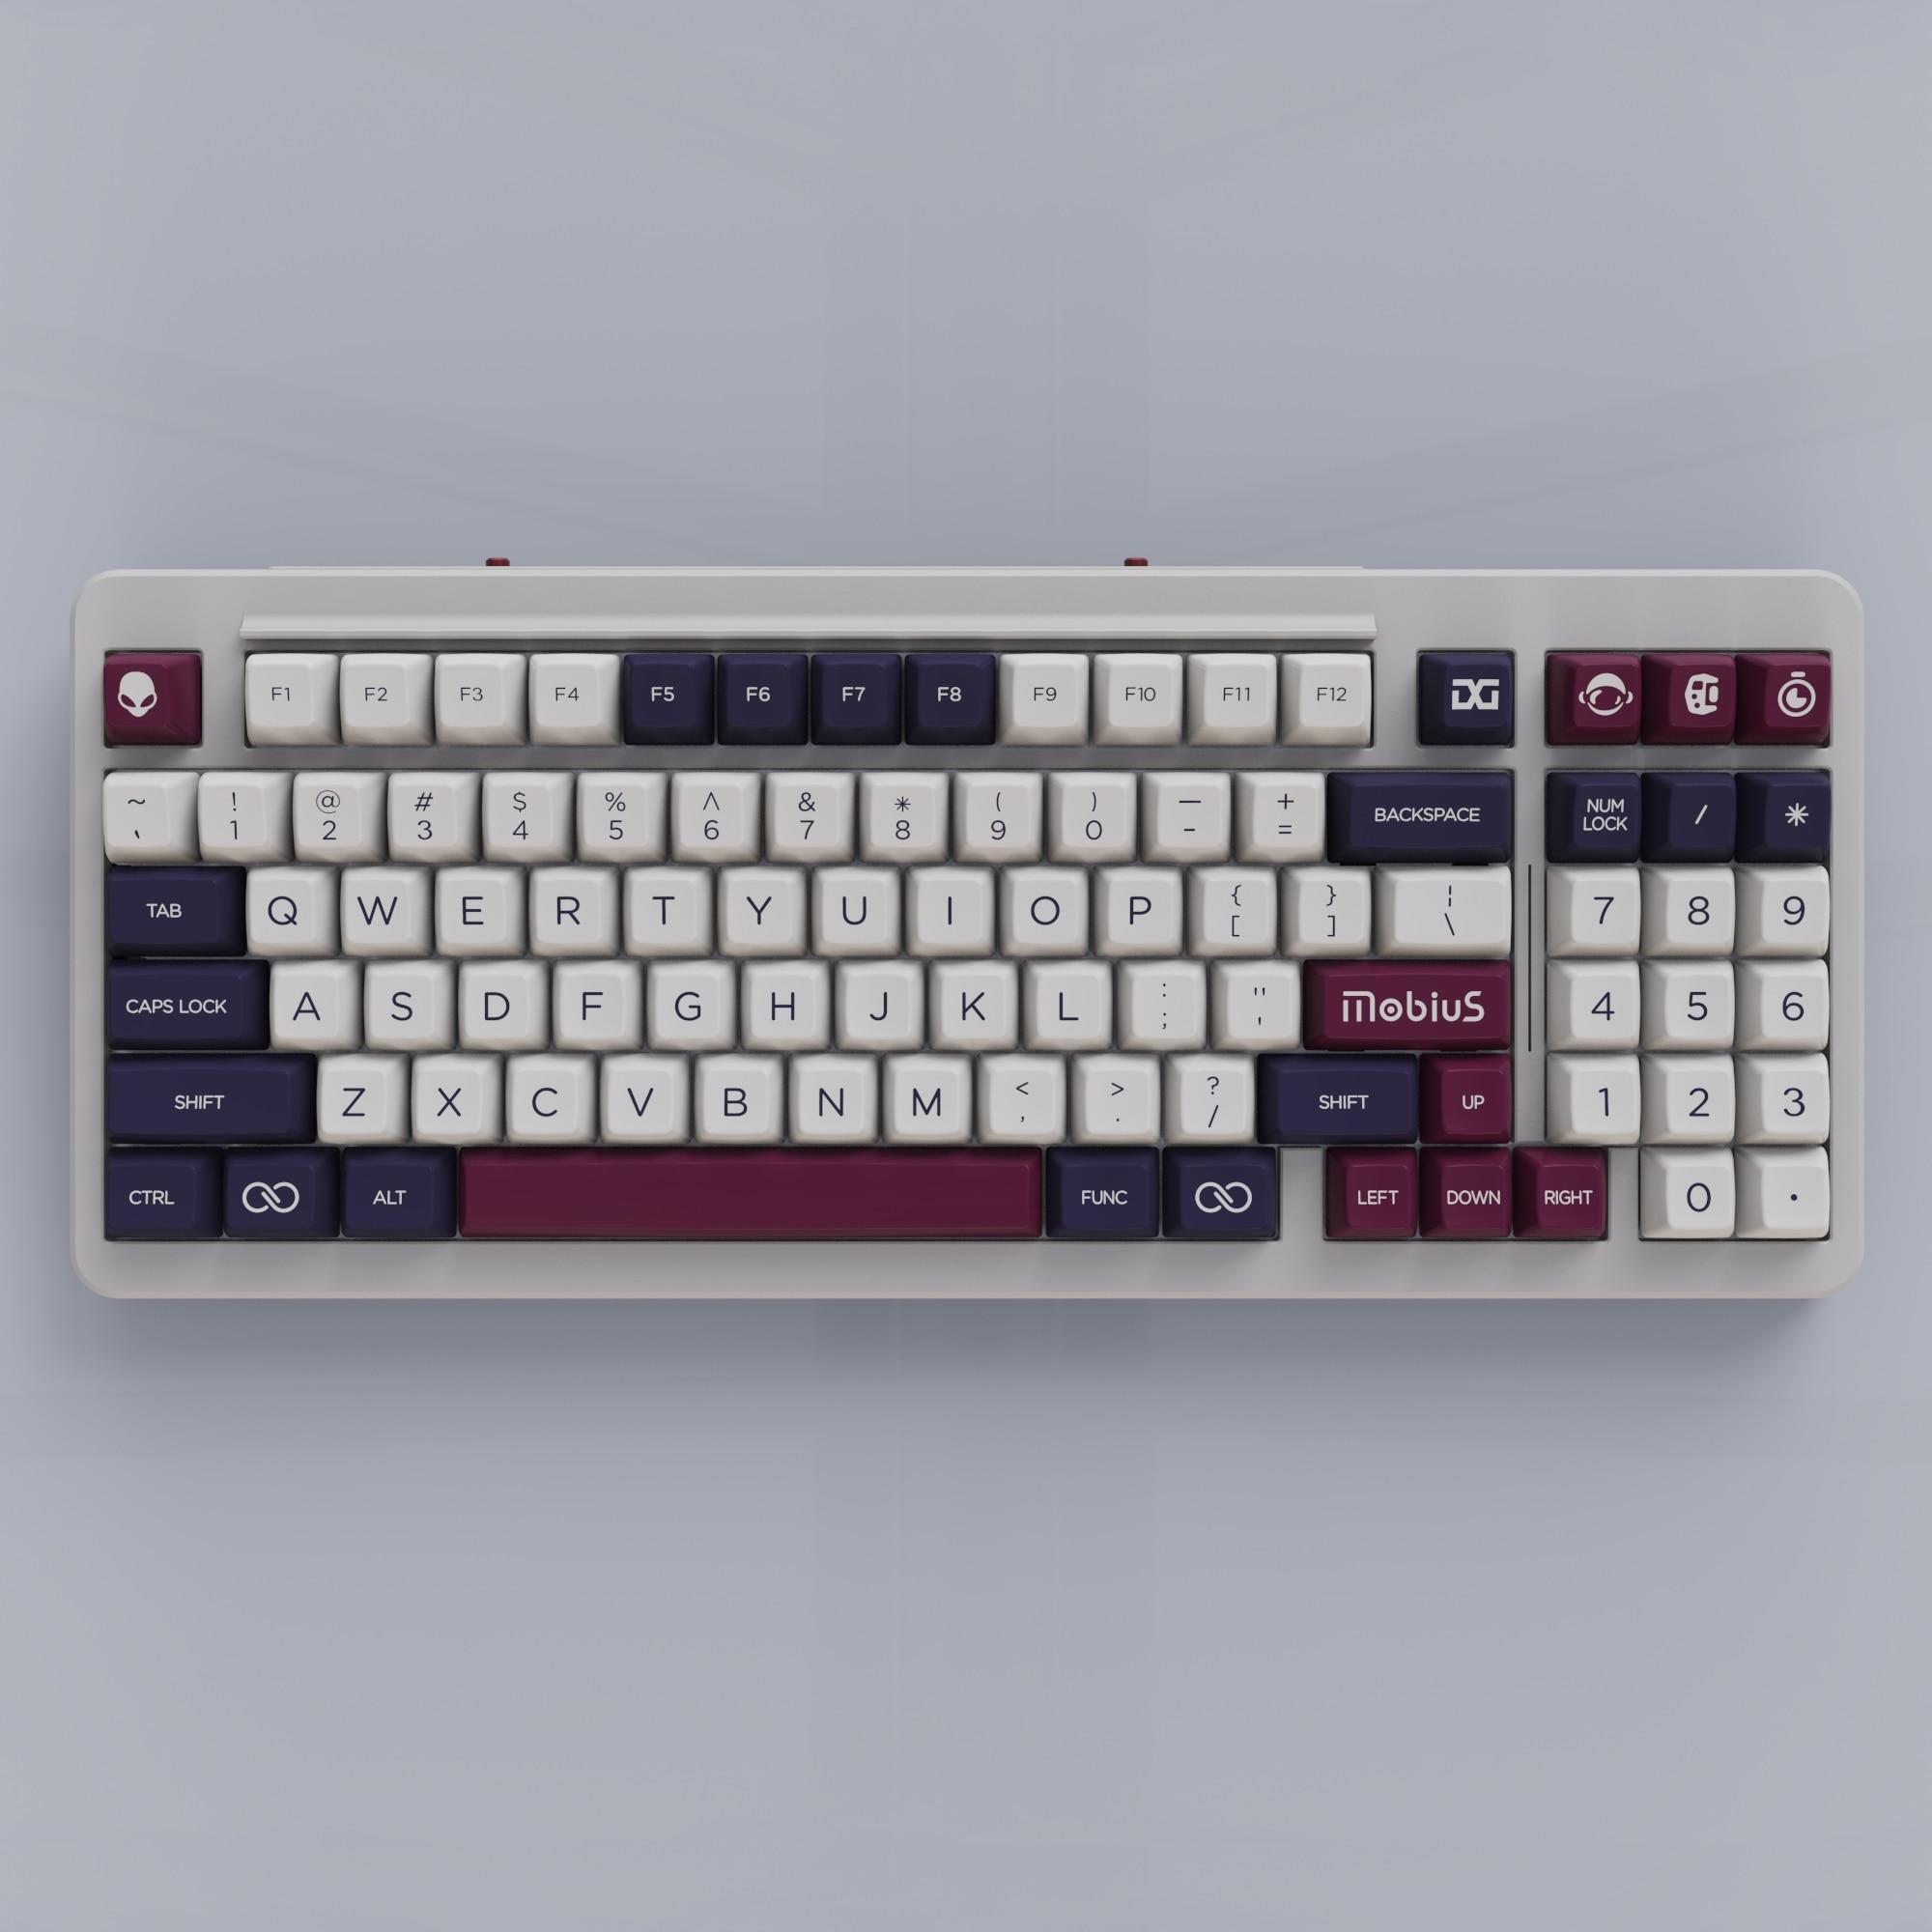 Domikey sa abs conjunto de keycap duplo mobius sa perfil para mx stem teclado poker 87 104 gh60 xd64 xd68 xd84 xd96 xd75 xd87